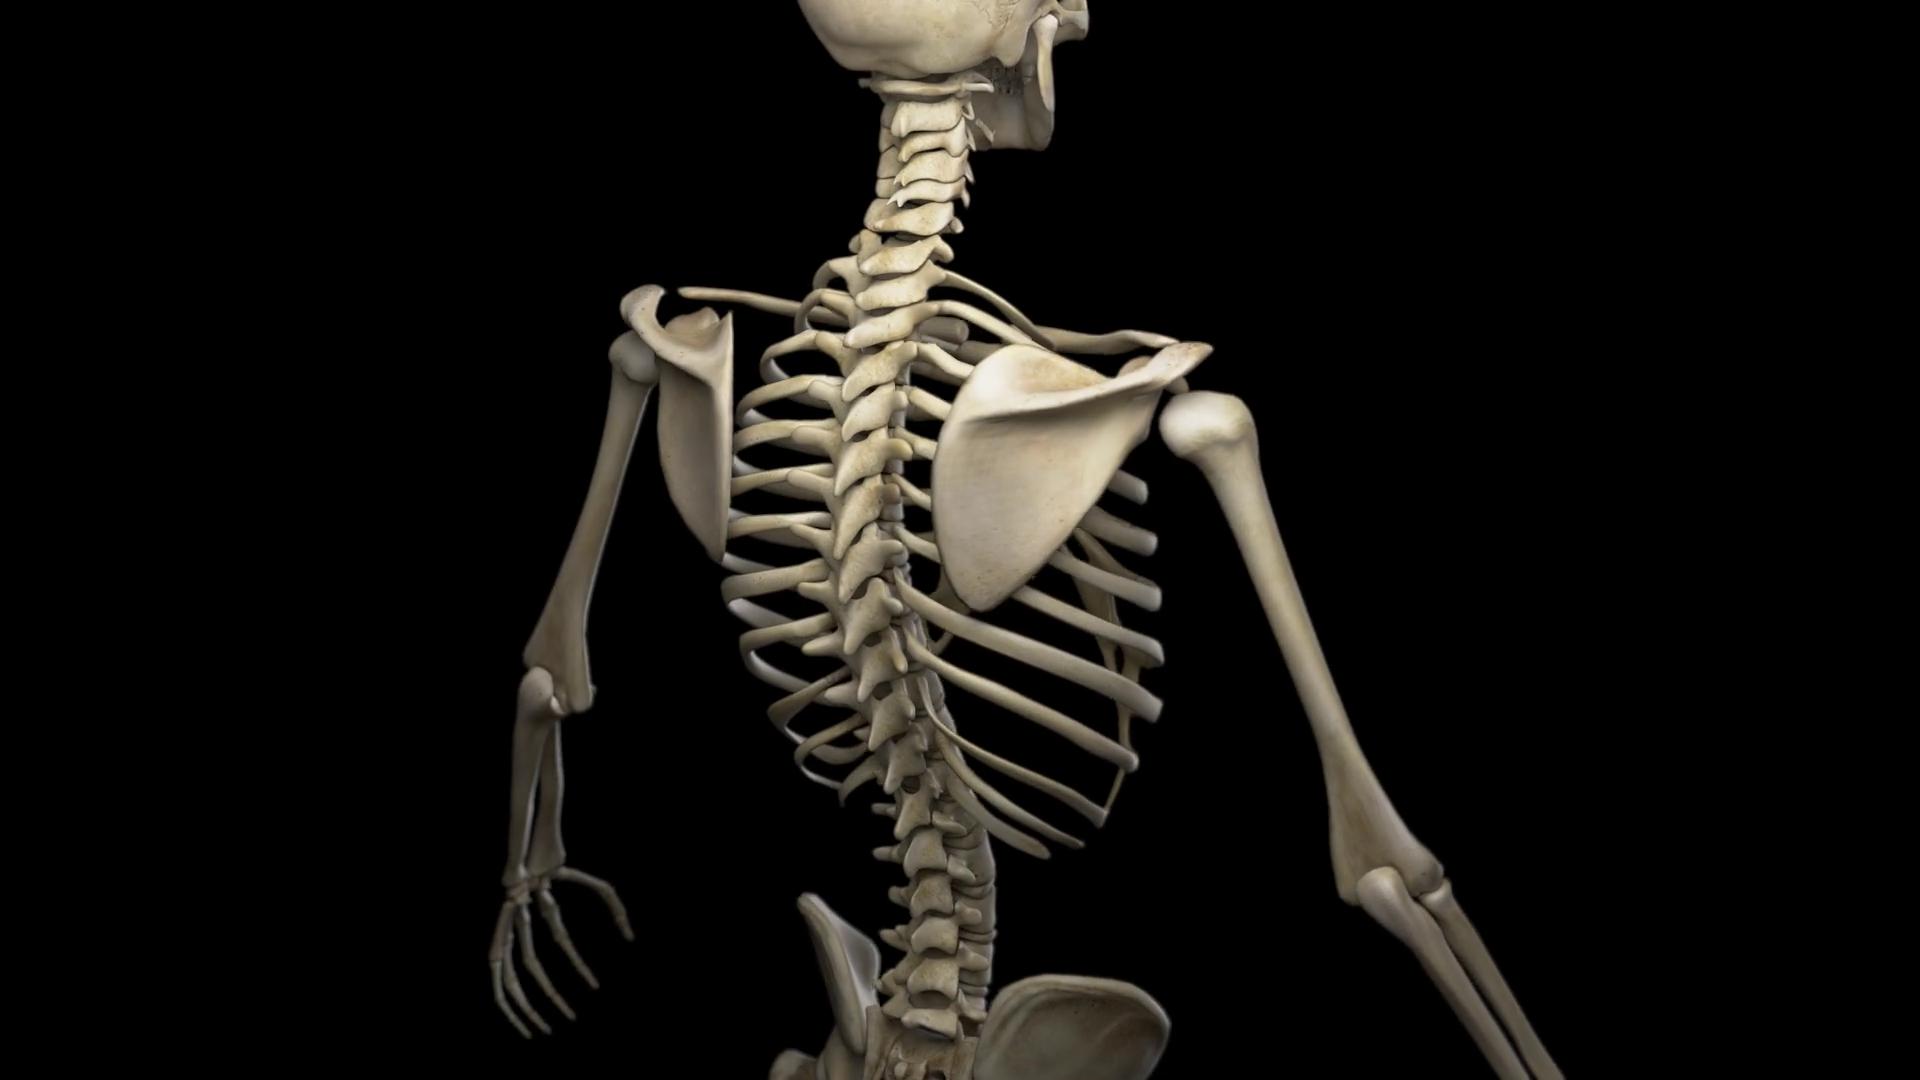 Image-Of-Human-Skeleton-Simply-Simple-Photo-Gallery-Website-With-Image-Of-Human-Skeleton.png